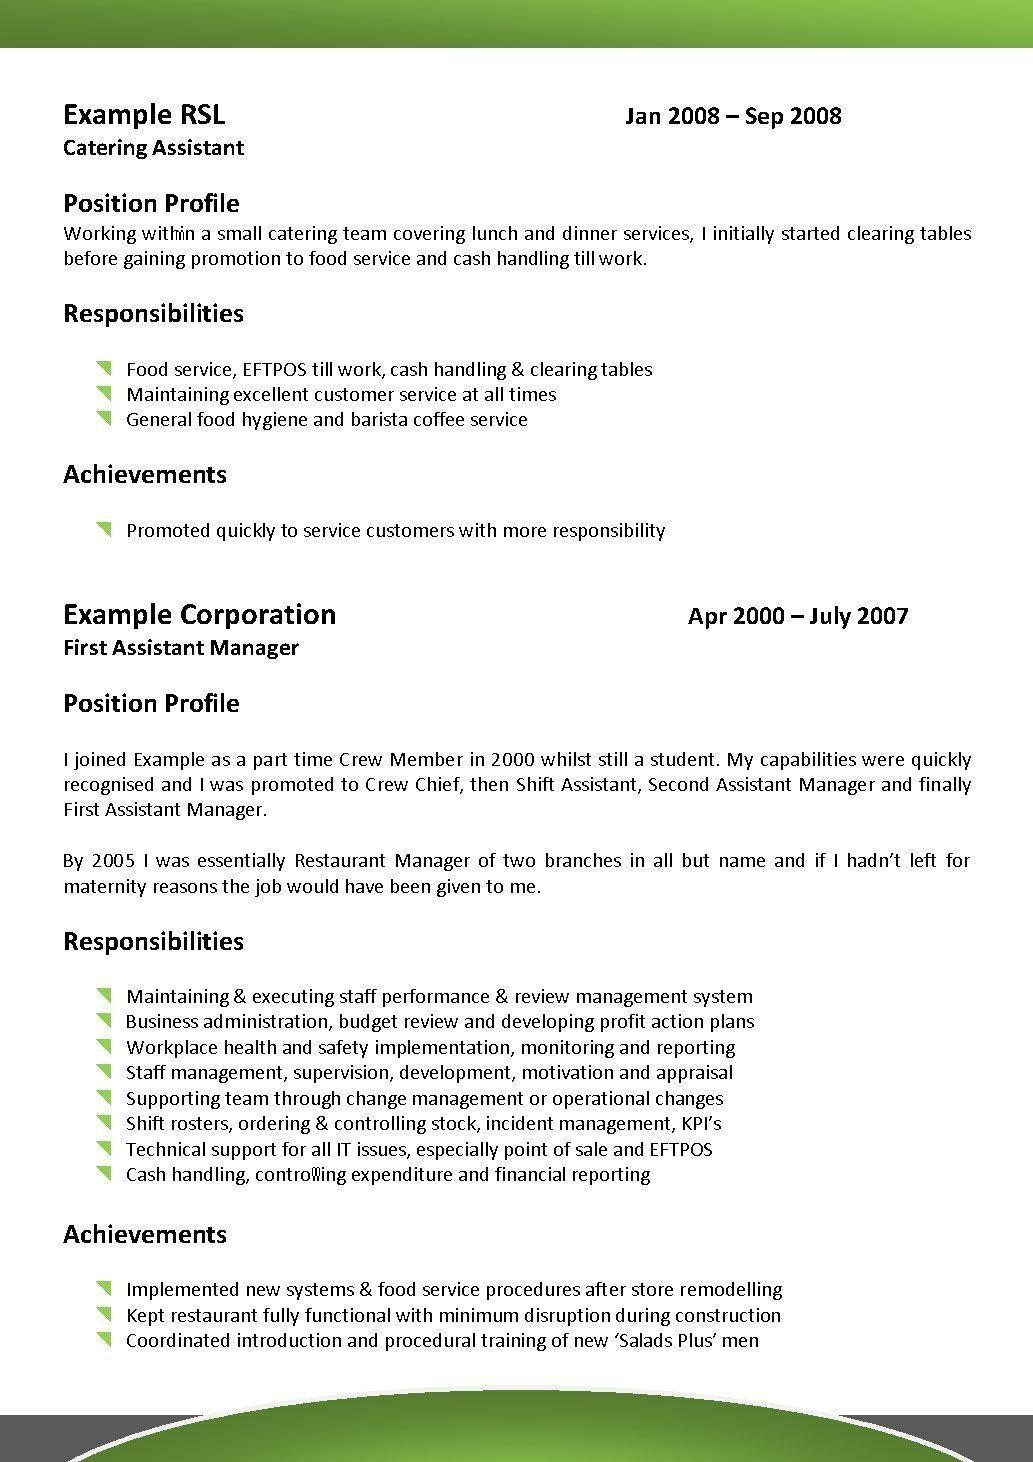 Hospitality Job Resume Examples Resume Objective Examples